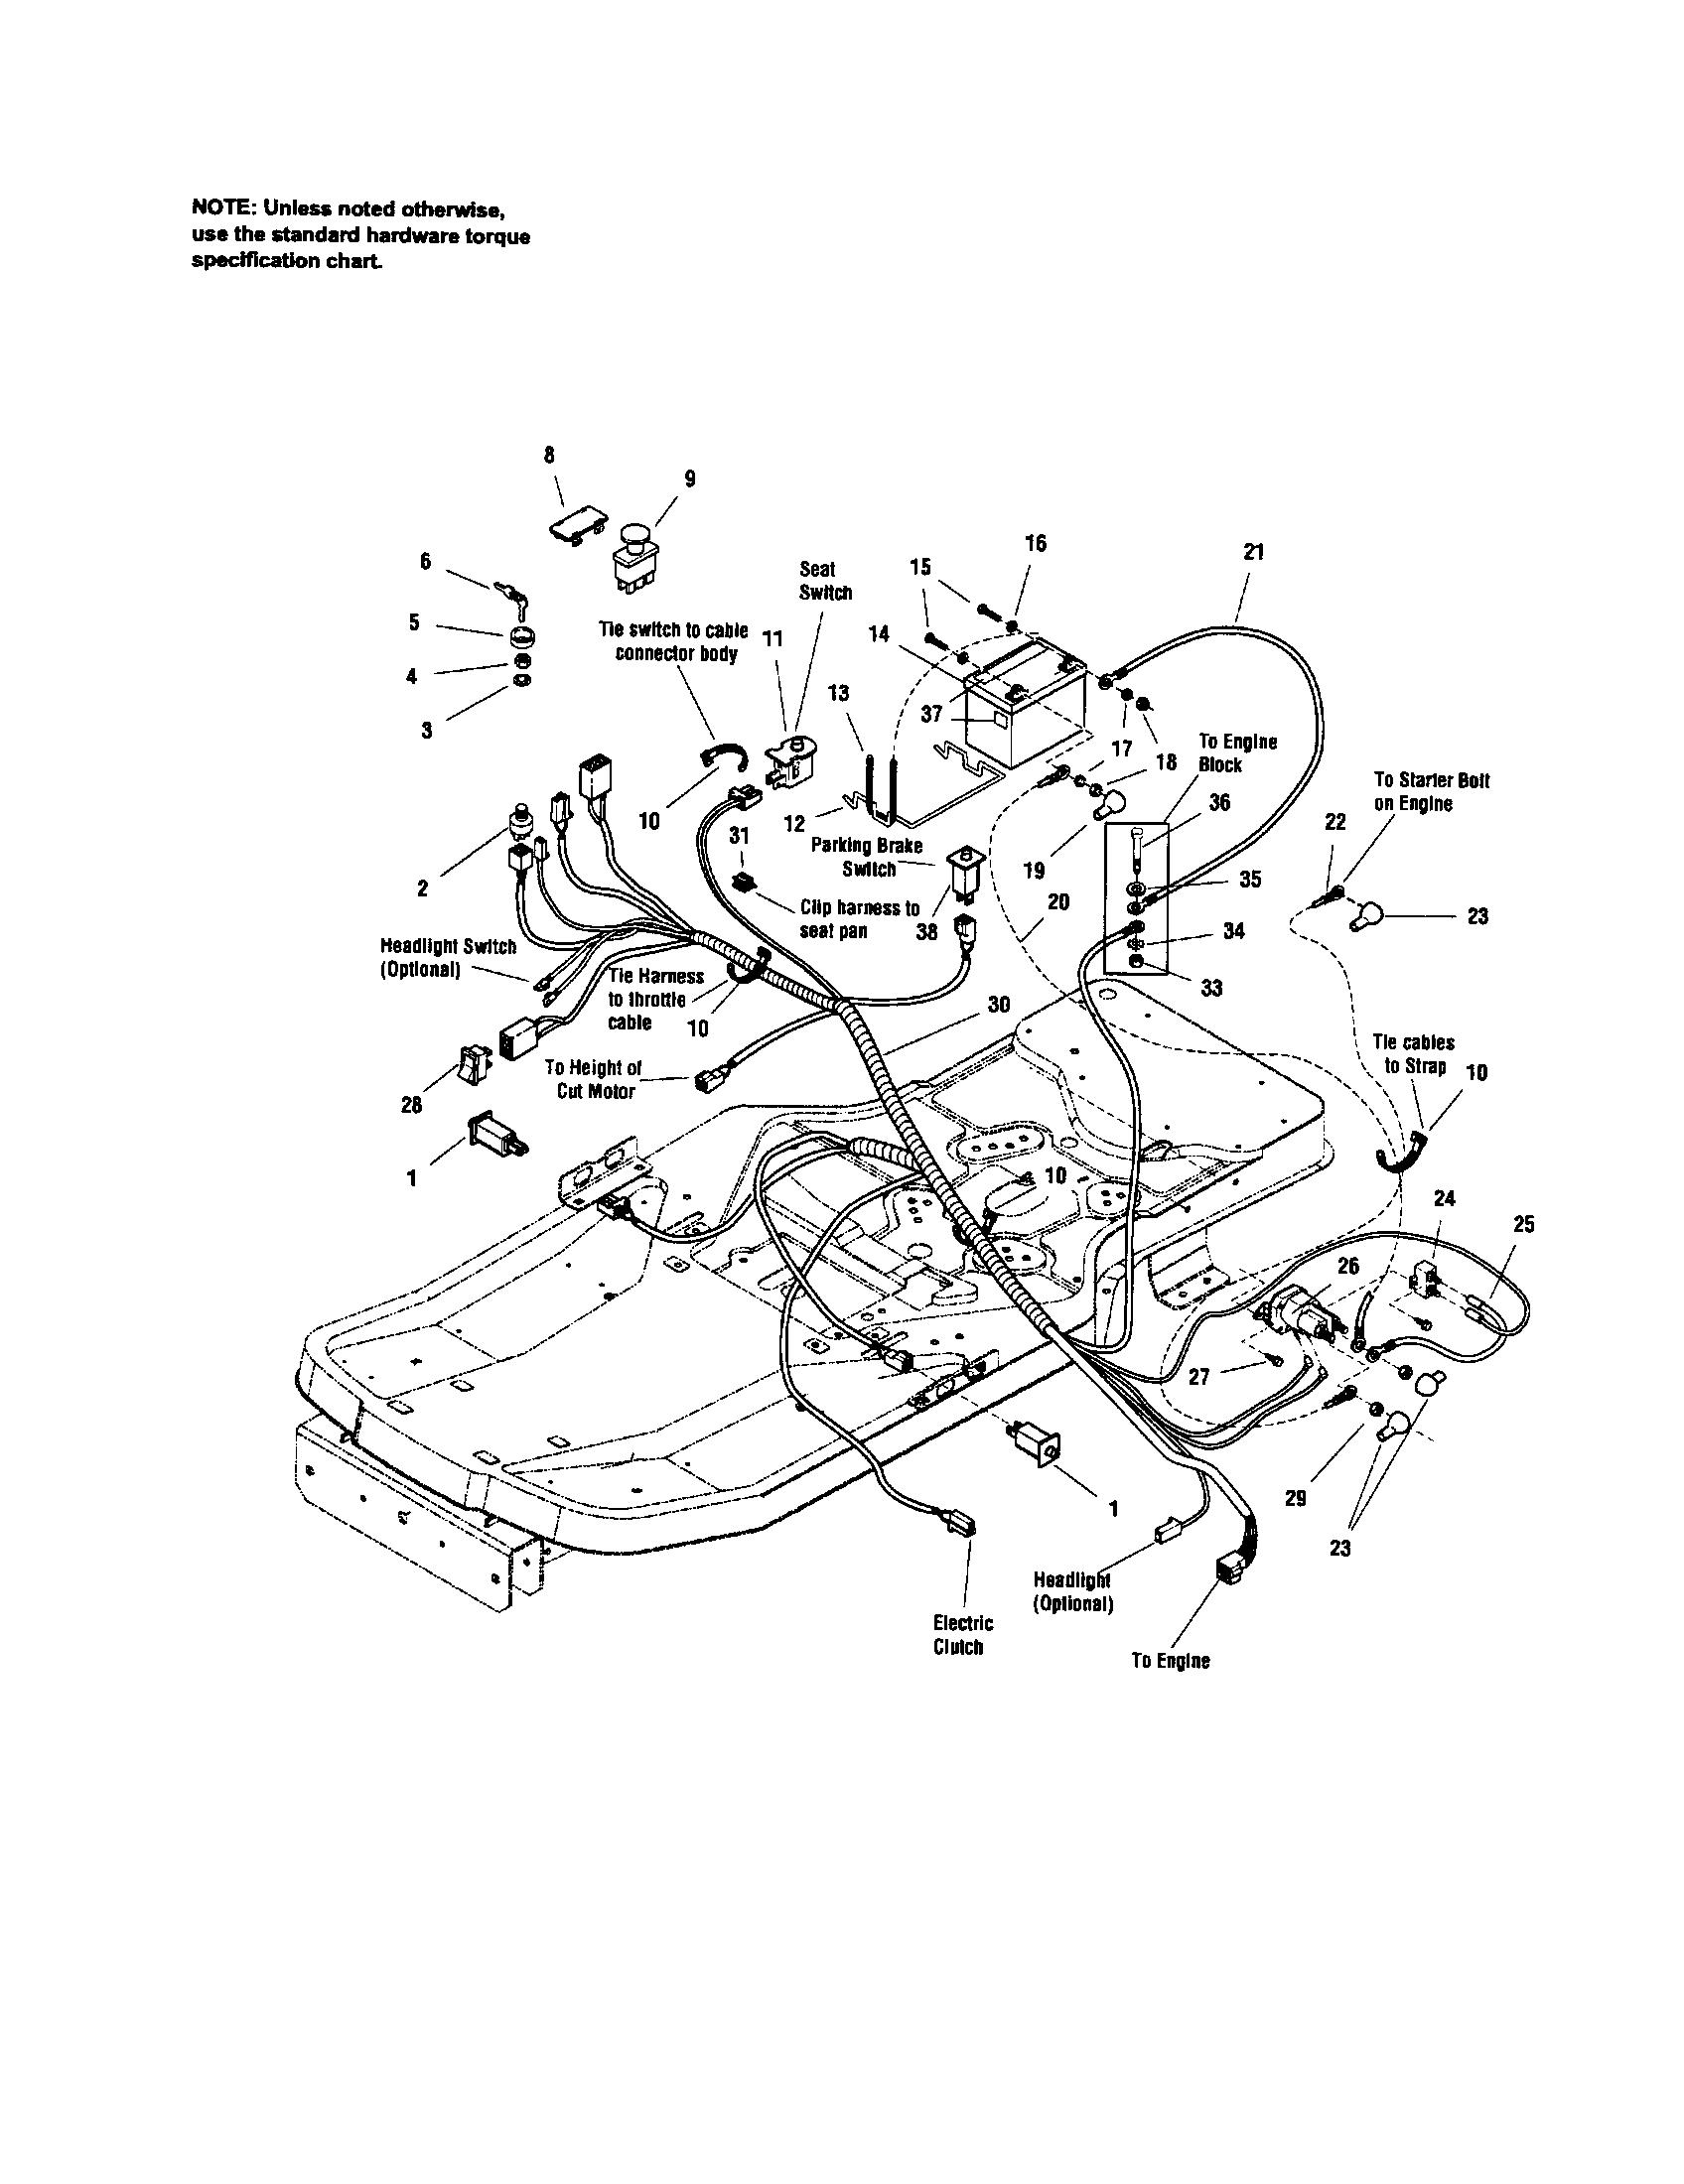 zts 7500 belt diagram Craftsman GT Mower Wiring Diagram